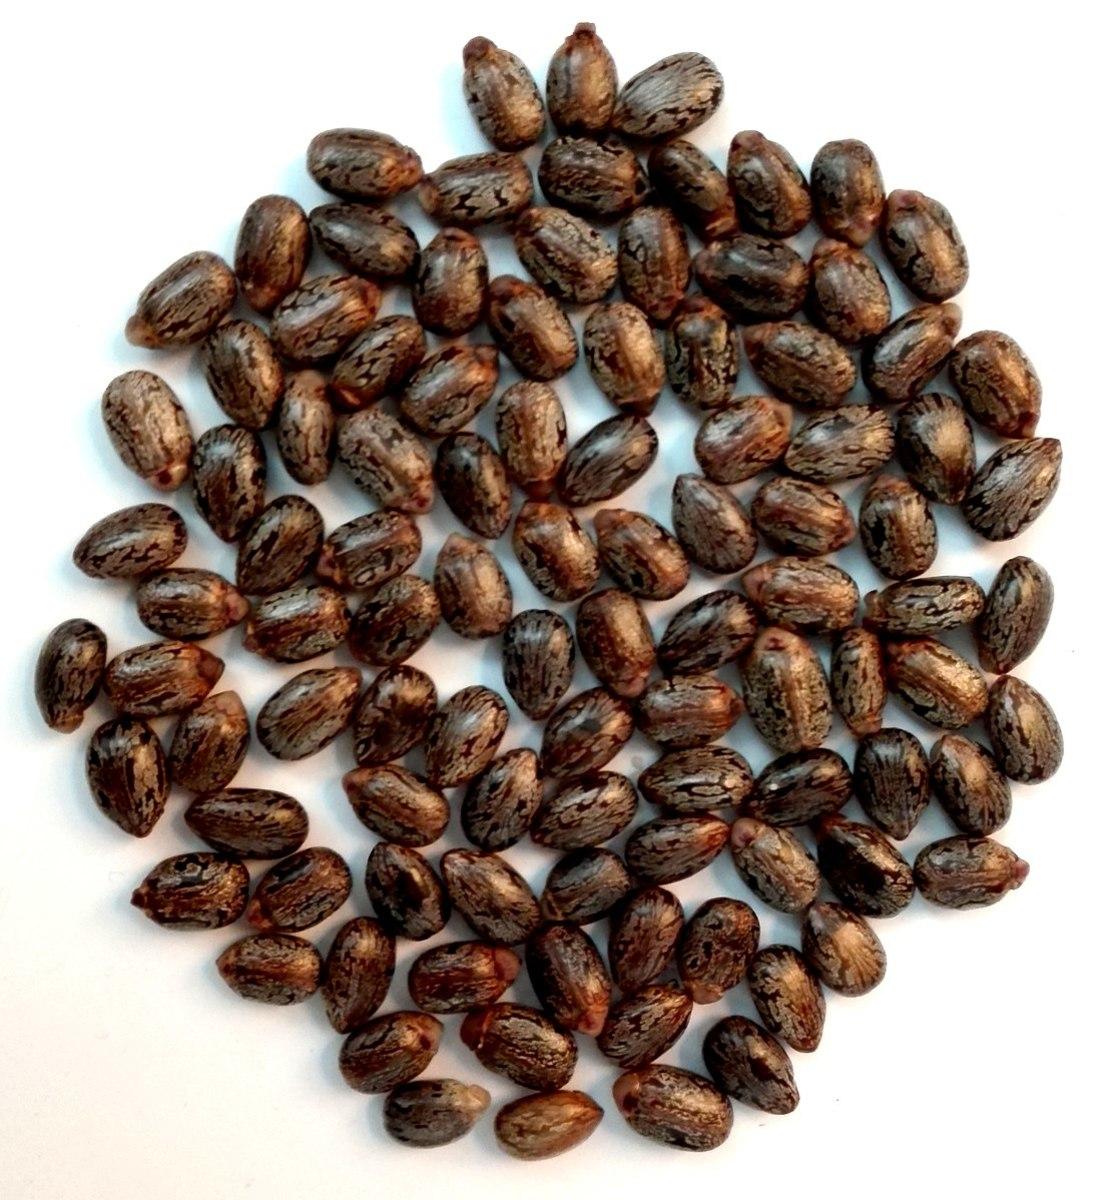 Castor beans from the Ricinus communis plant